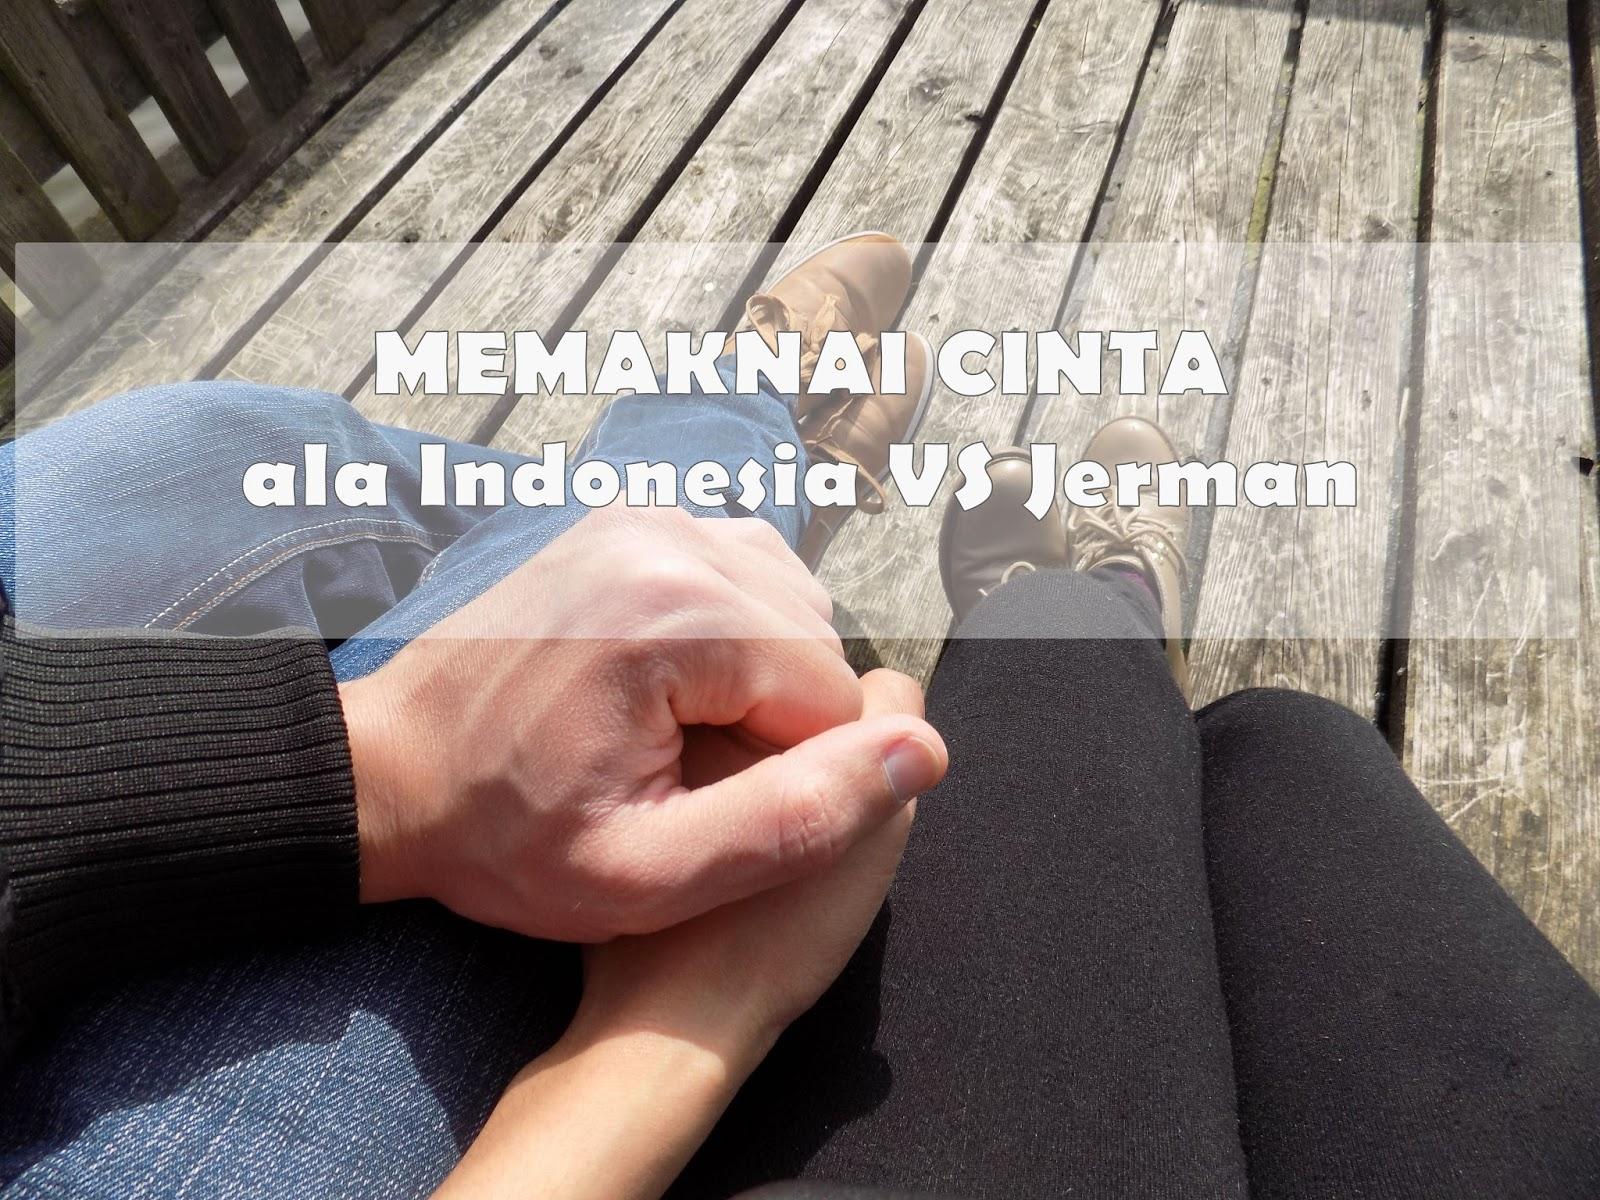 Jatuh Cinta Ala Jerman Atau Indonesia German Culture Blog